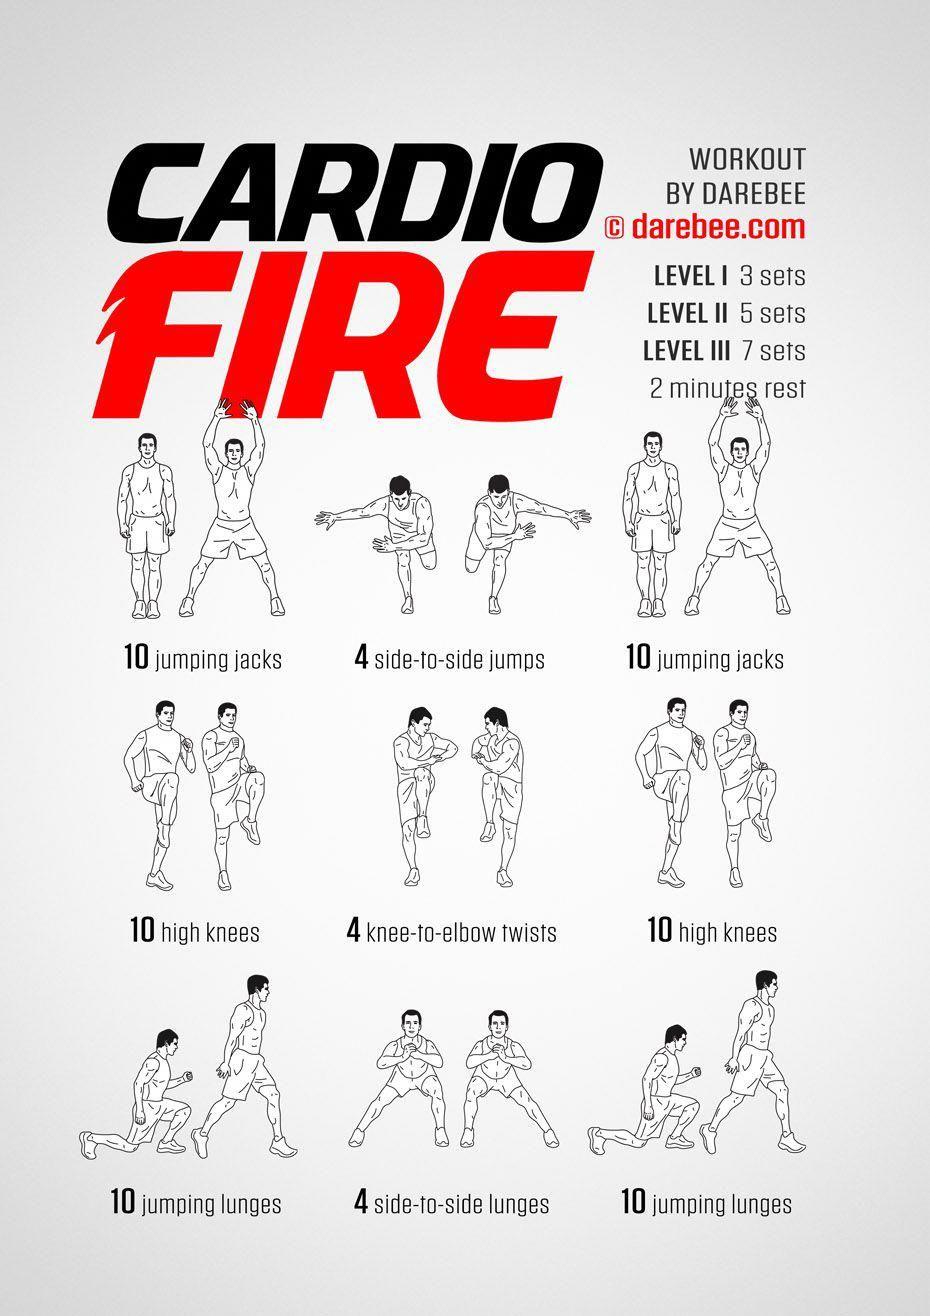 Cardio Fire Workout Ejercicios De Calistenia Ejercicios De Cardio Ejercicios De Entrenamiento